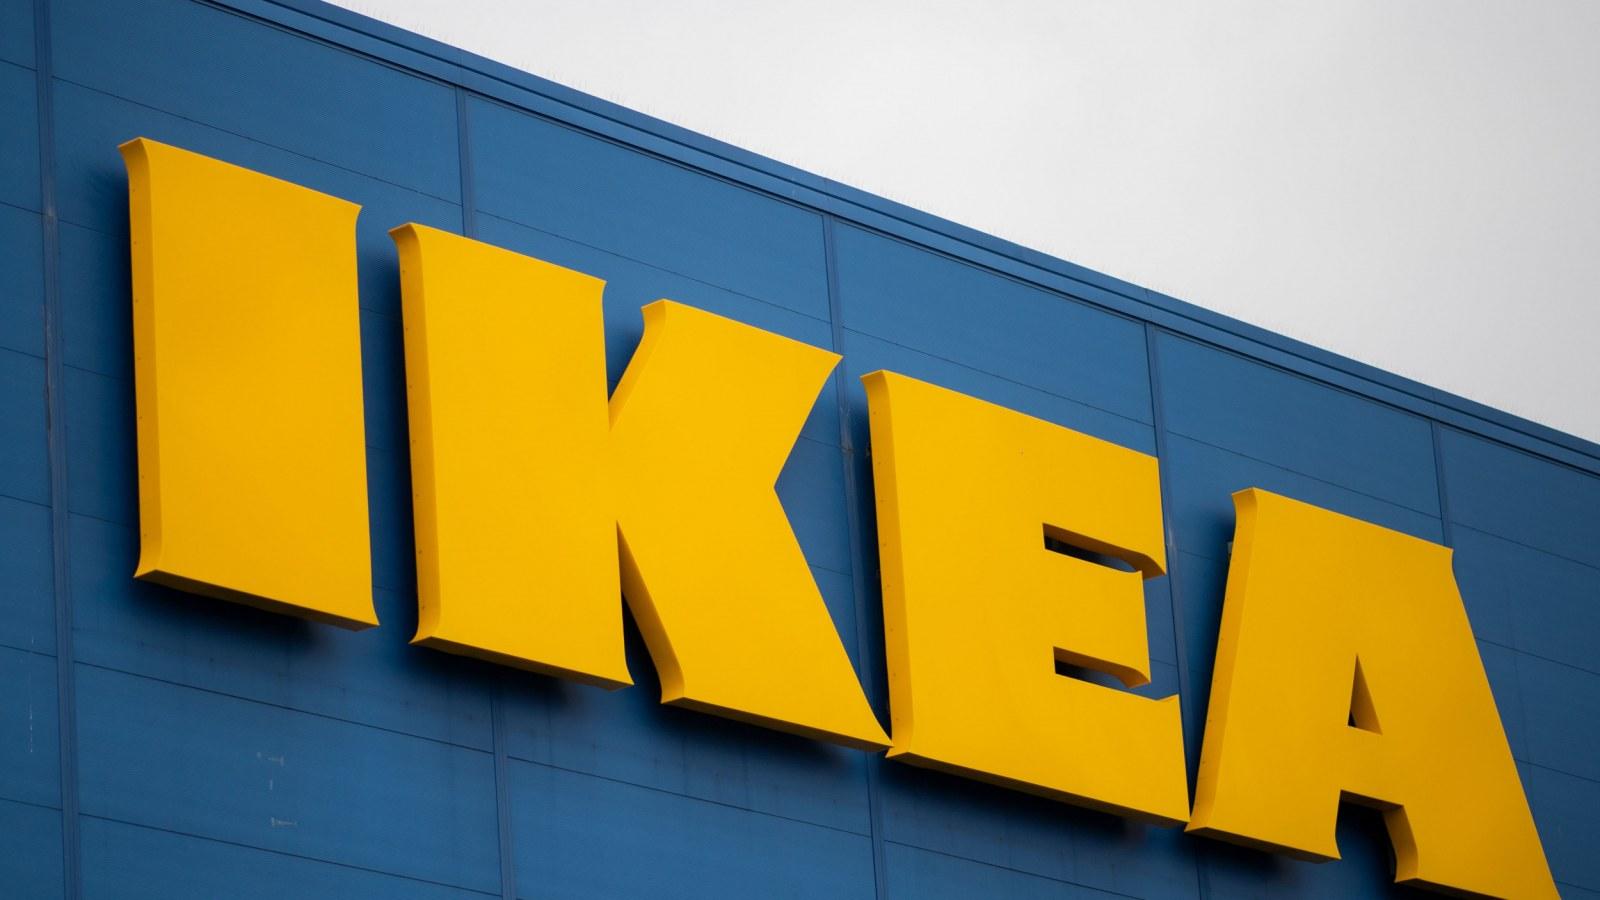 Staff Uncover CCTV Cameras In IKEA Toilets